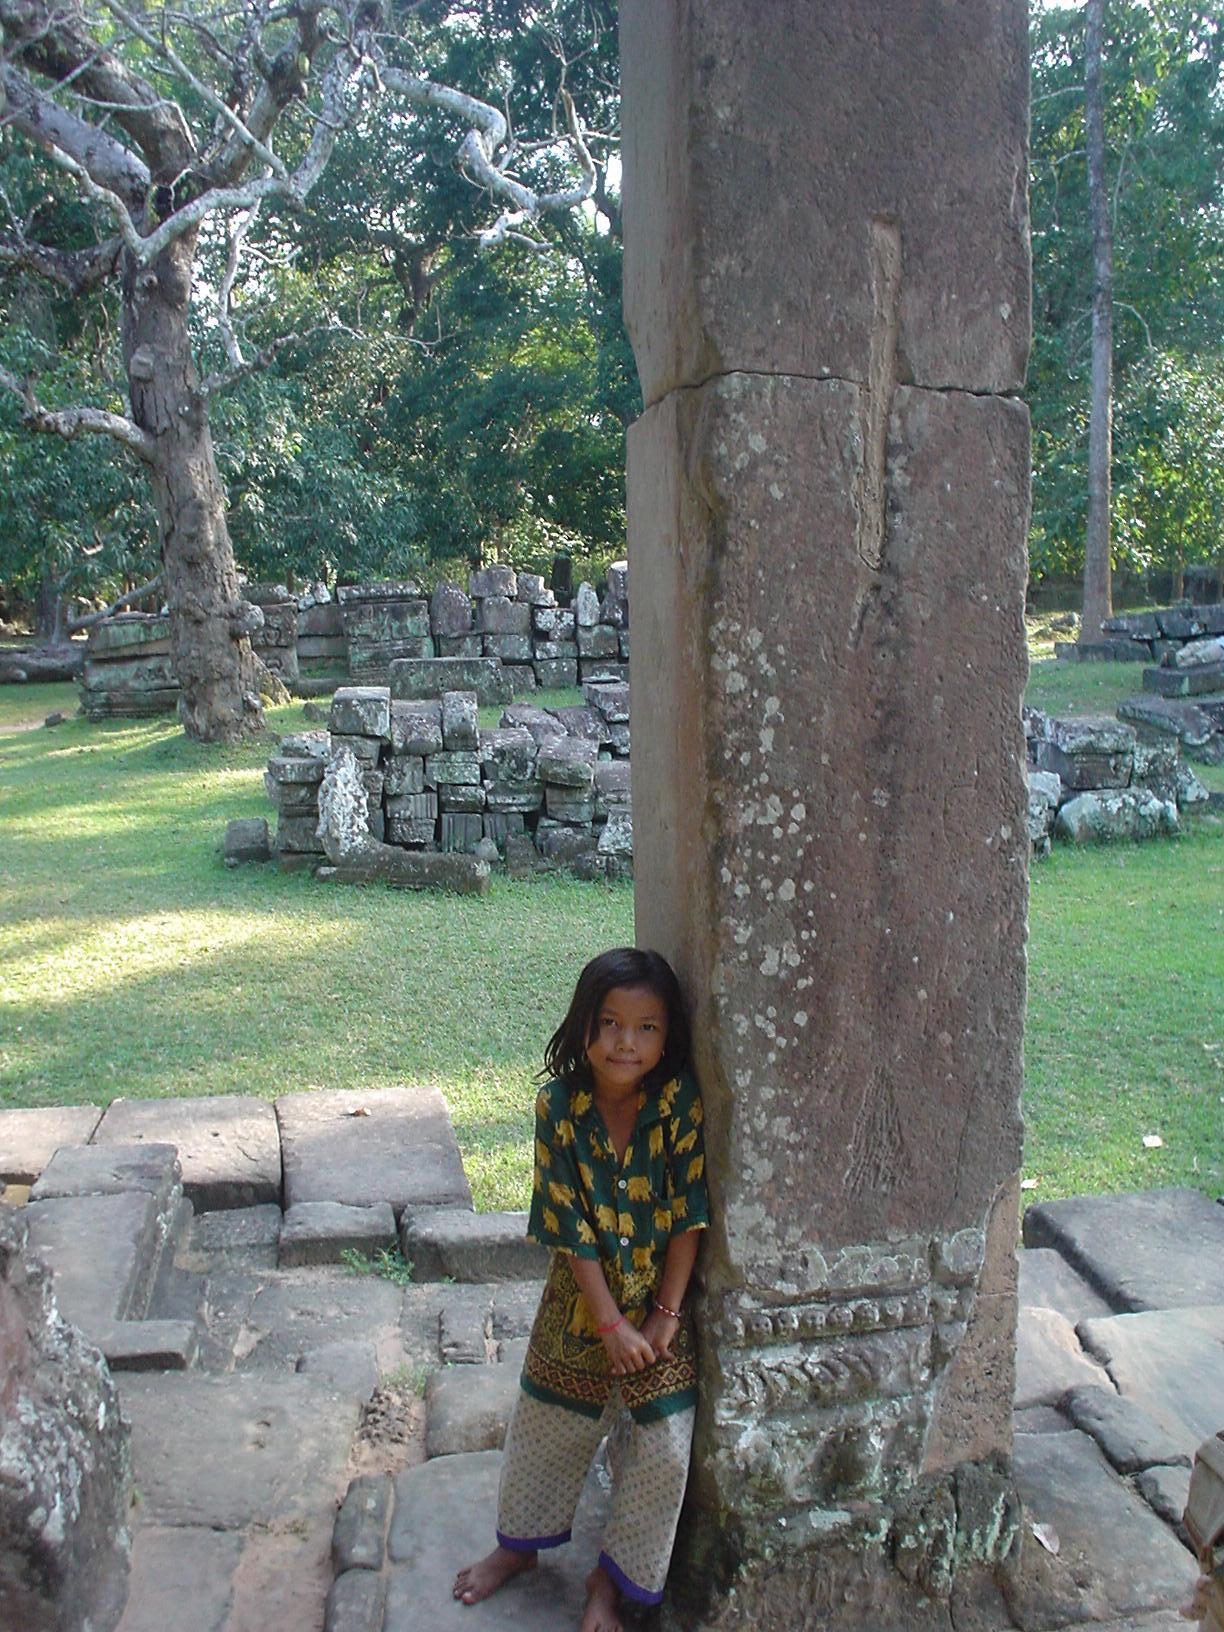 Siem Reap (Camboya) - Niña en untemplo